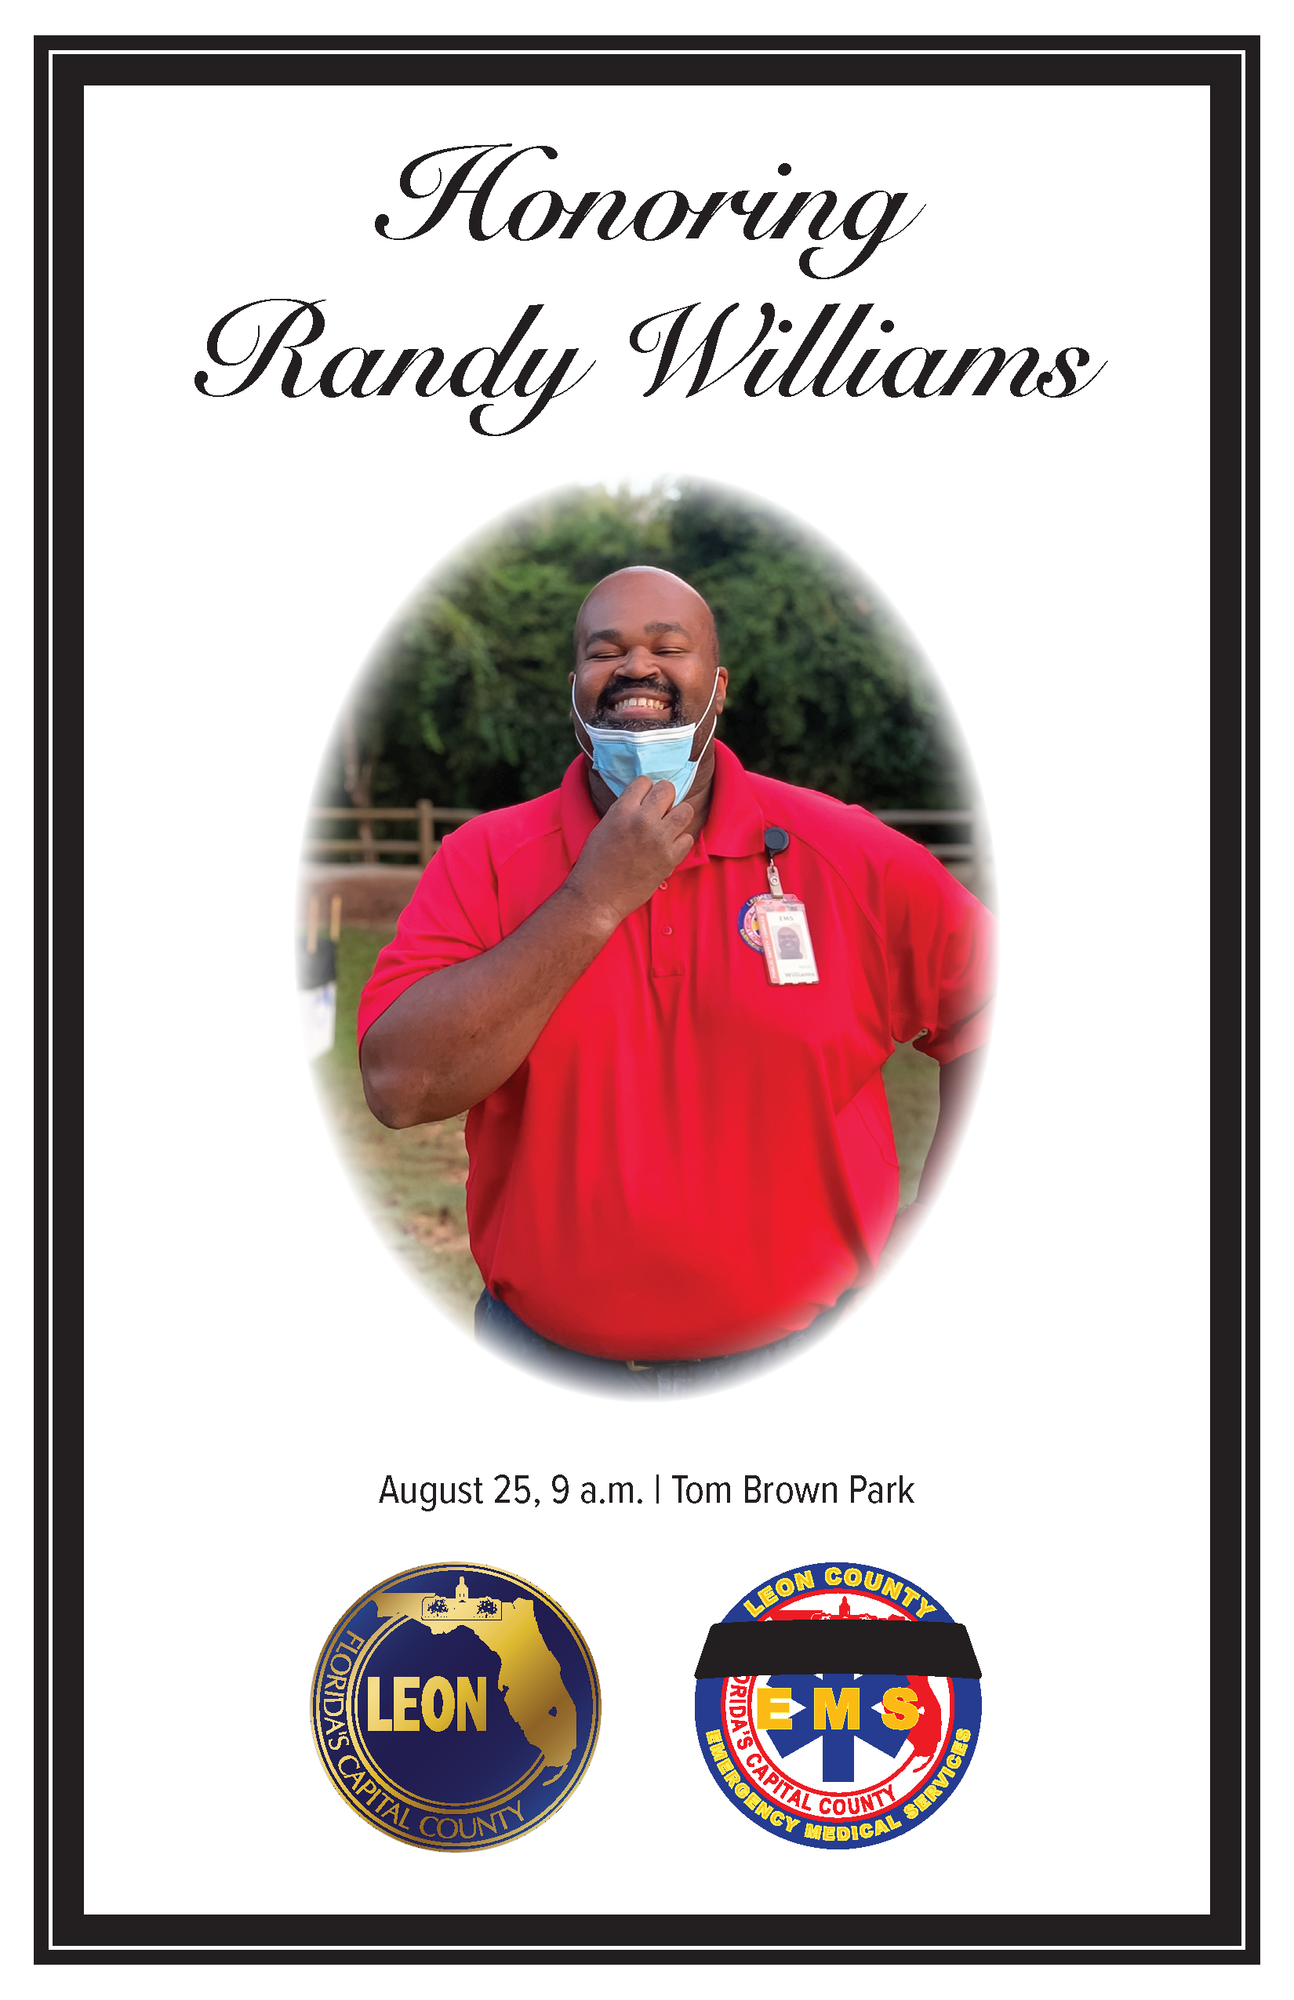 Cover of memorial program